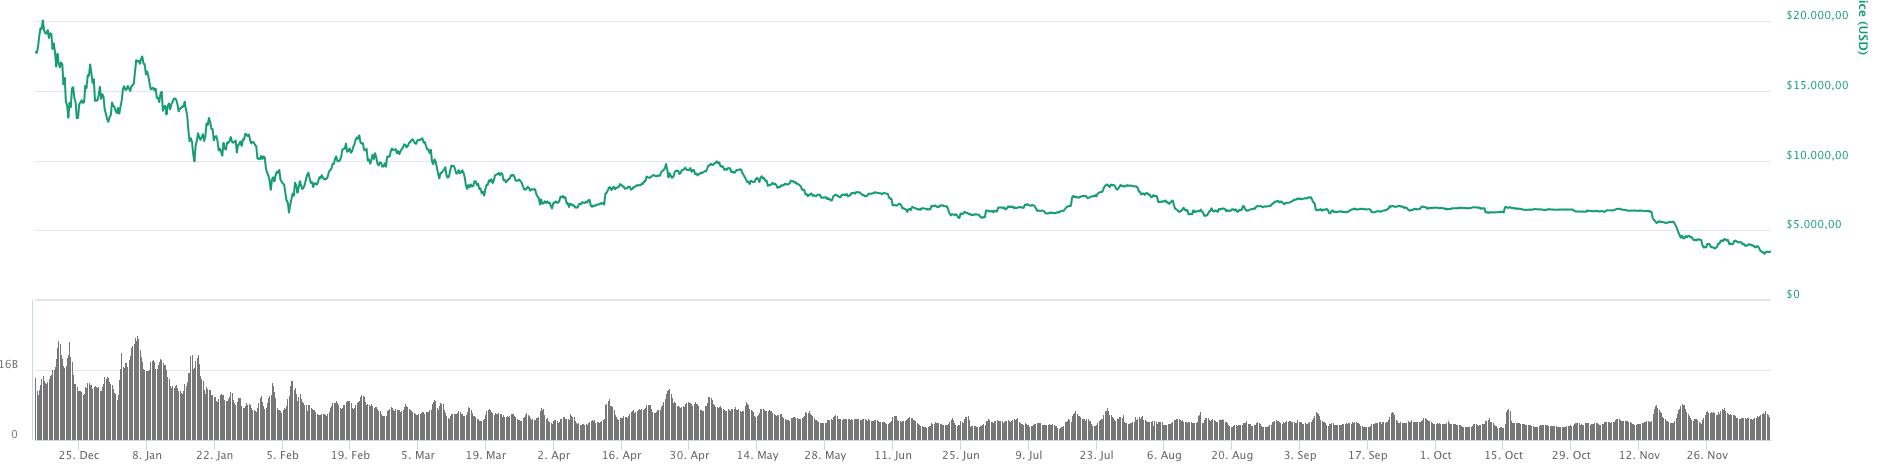 koers bitcoin 2018